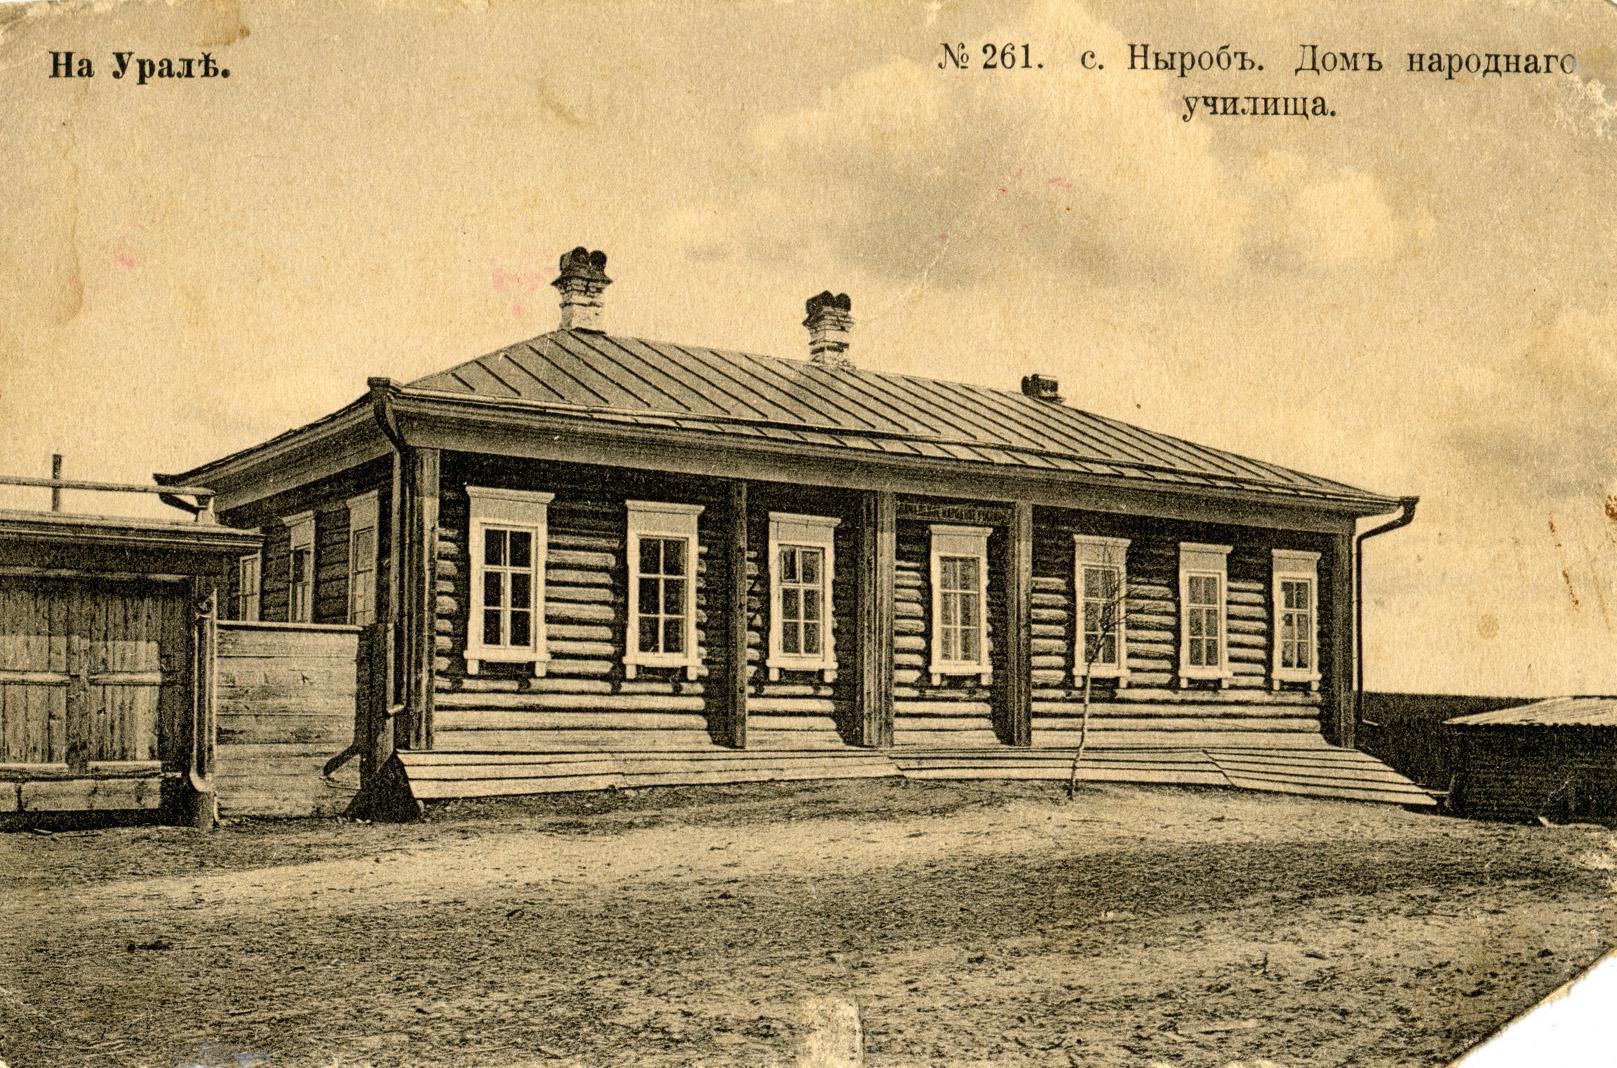 Дом народного училища